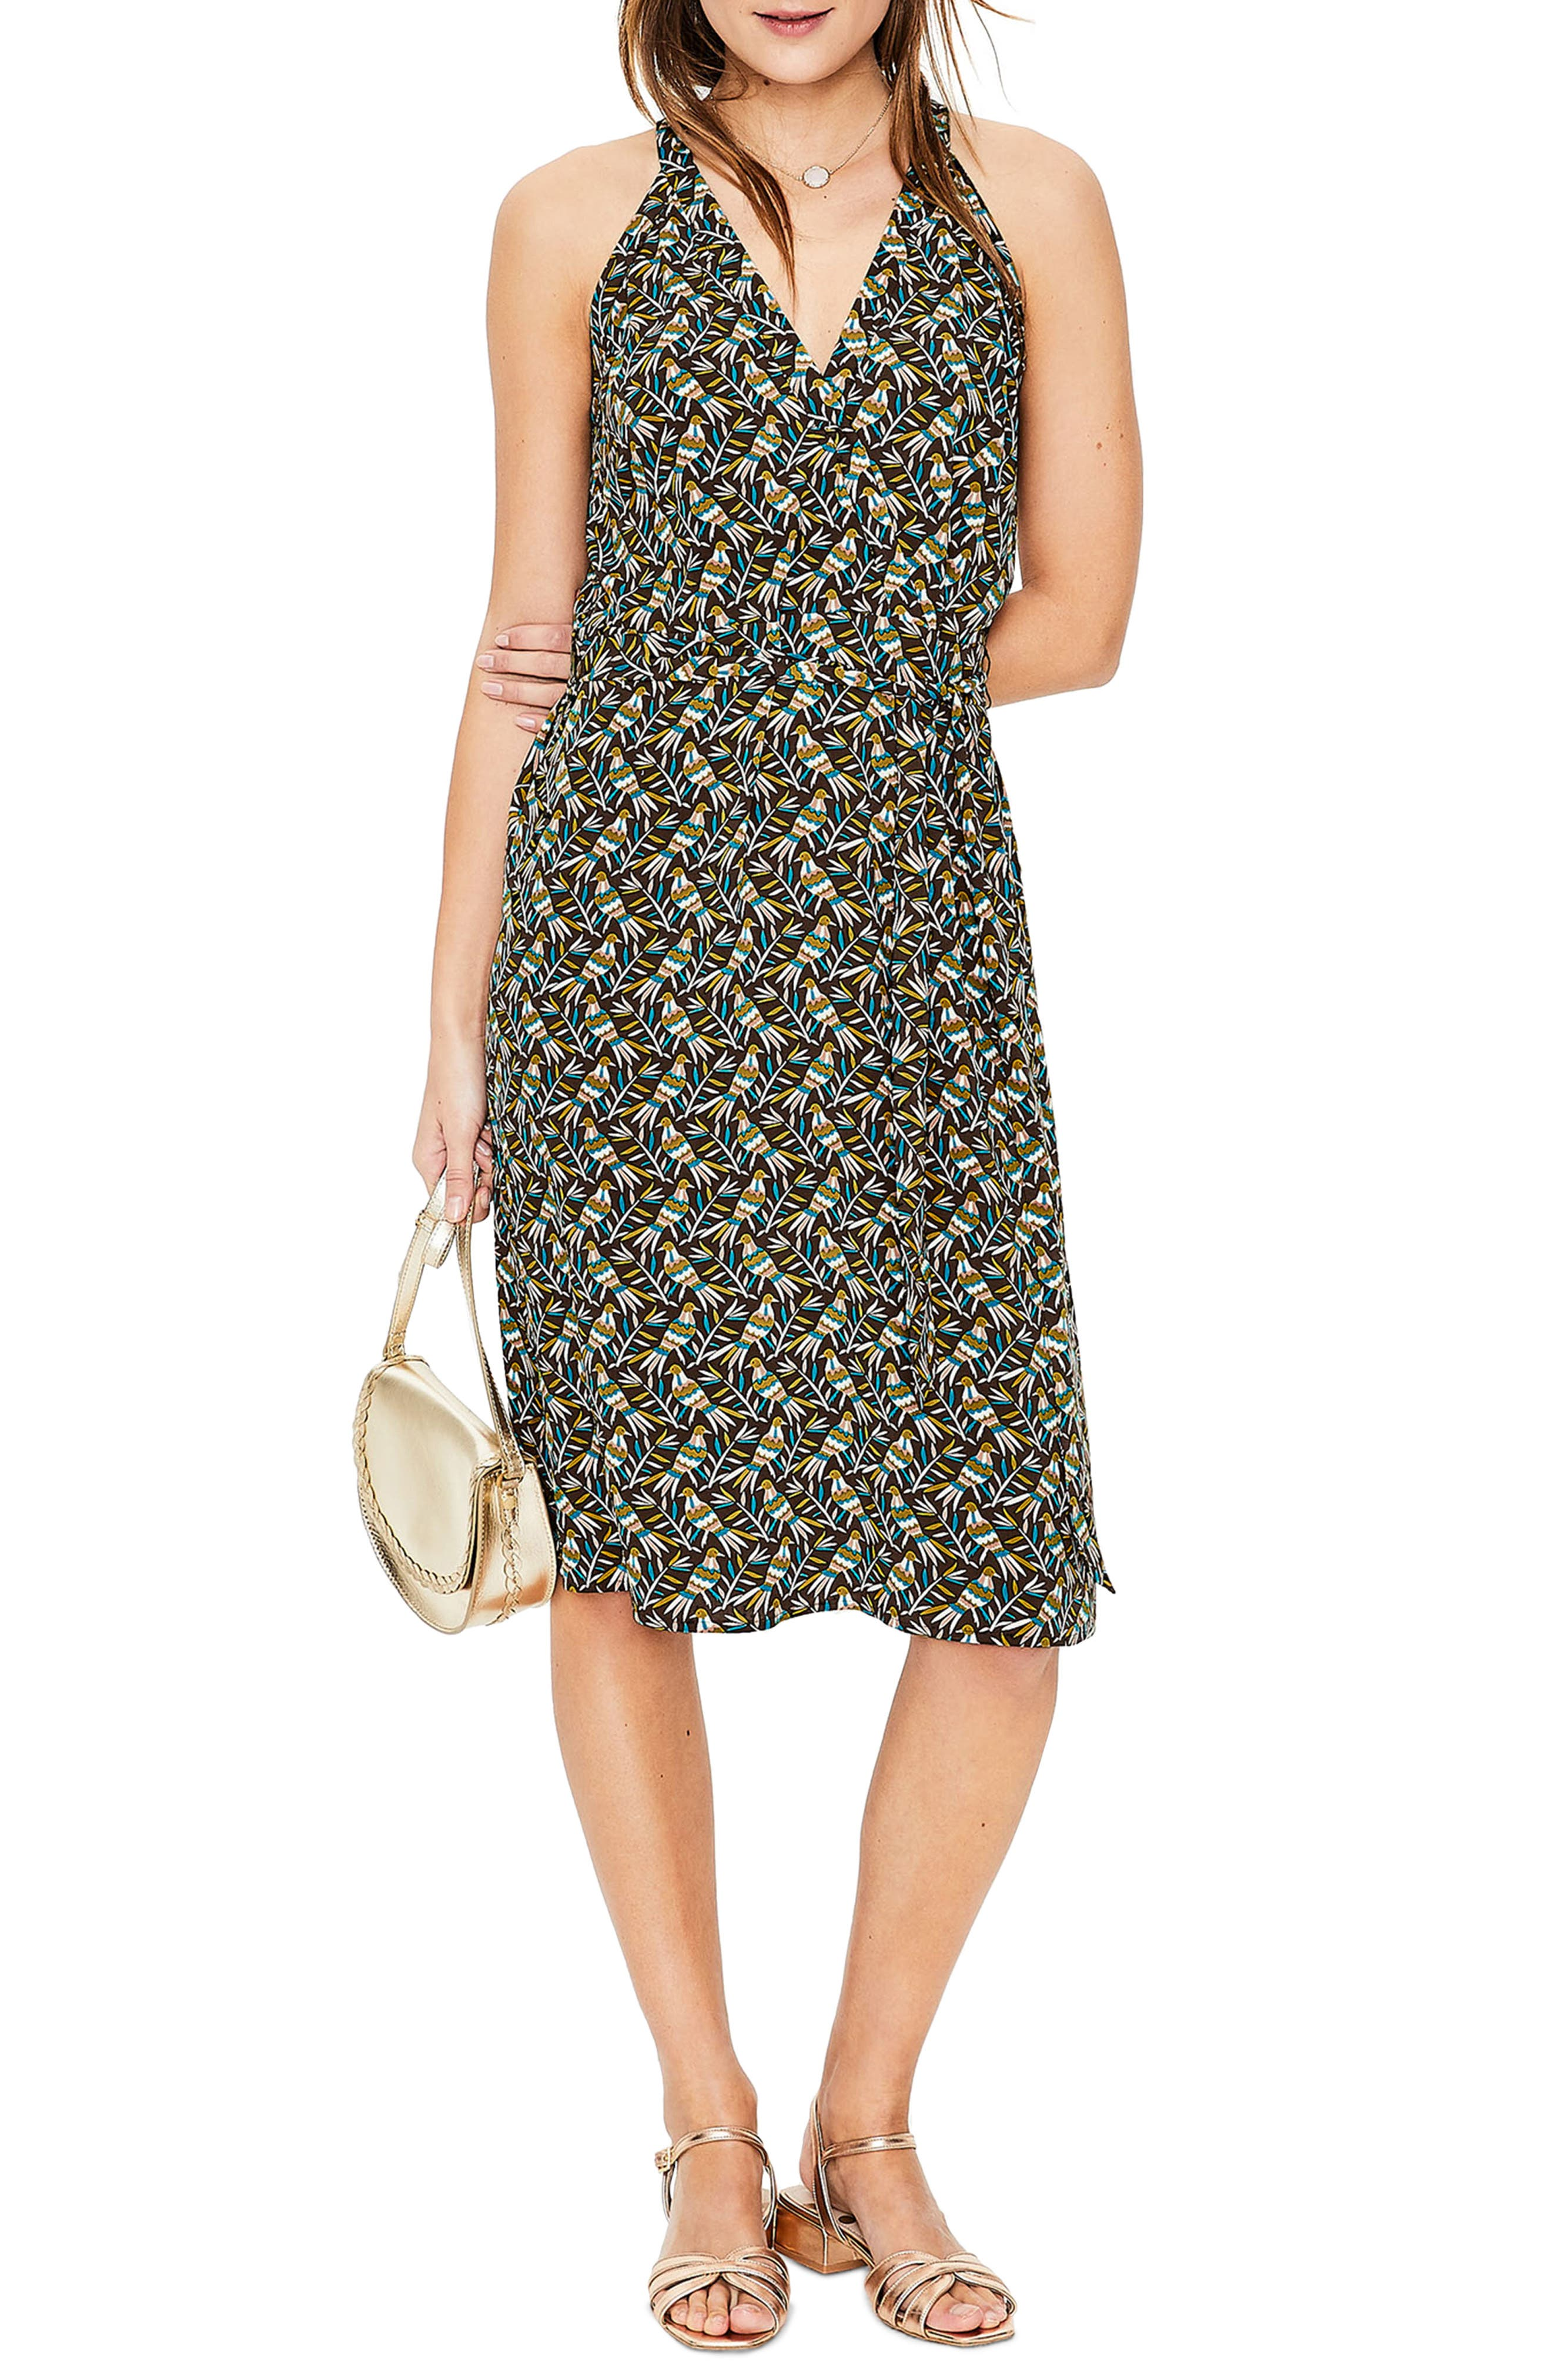 Boden Olwen Print Halter Dress, Green